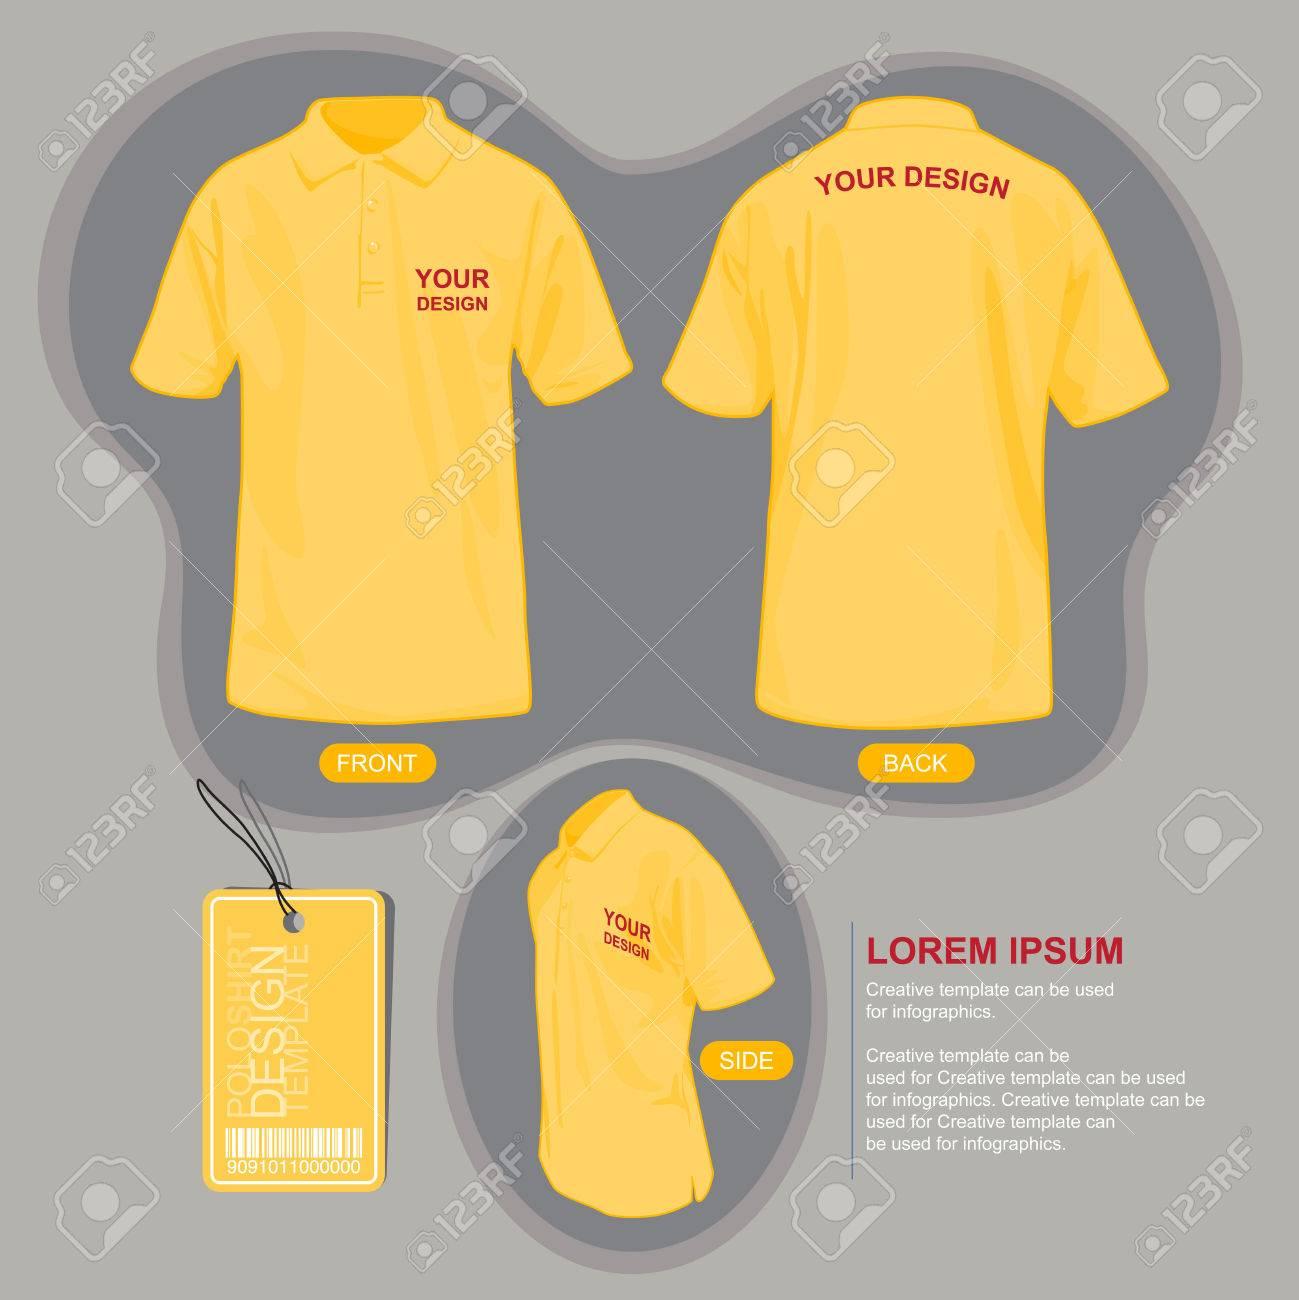 Shirt uniform design vector - Polo Shirt Uniform Template Illustration By Vector Design Stock Vector 49475779